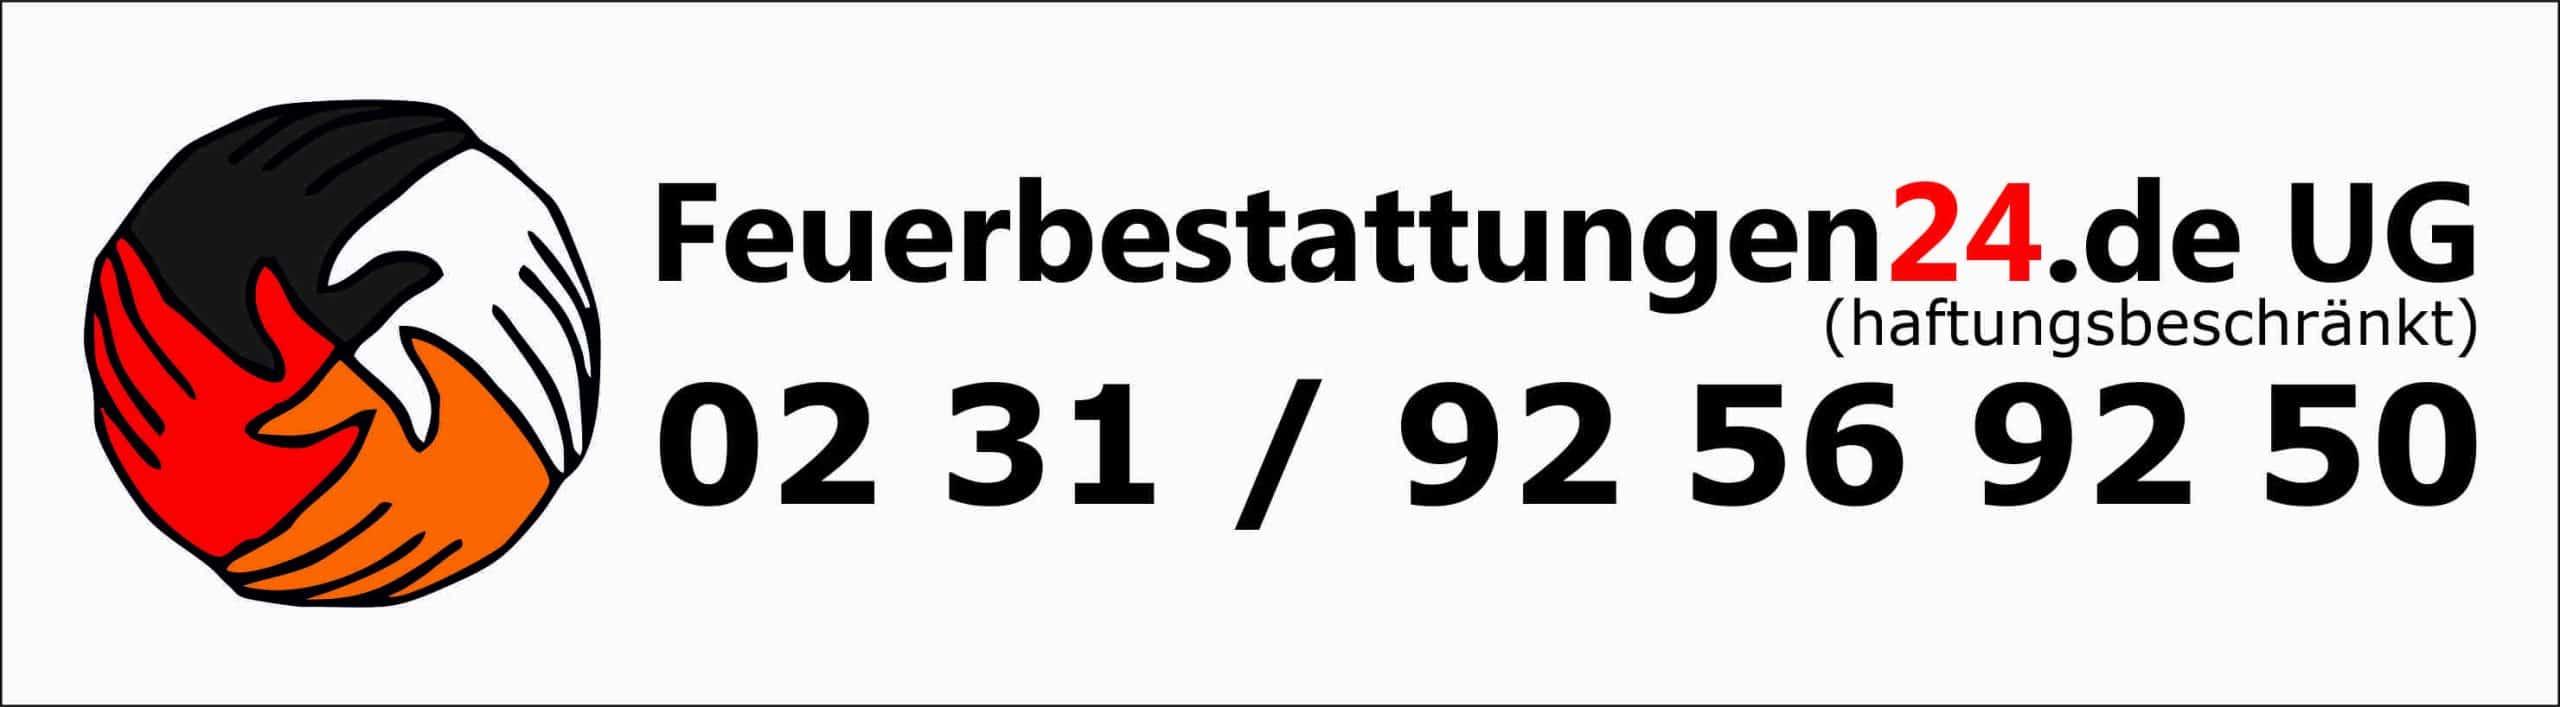 Feuerbestattungen24.de